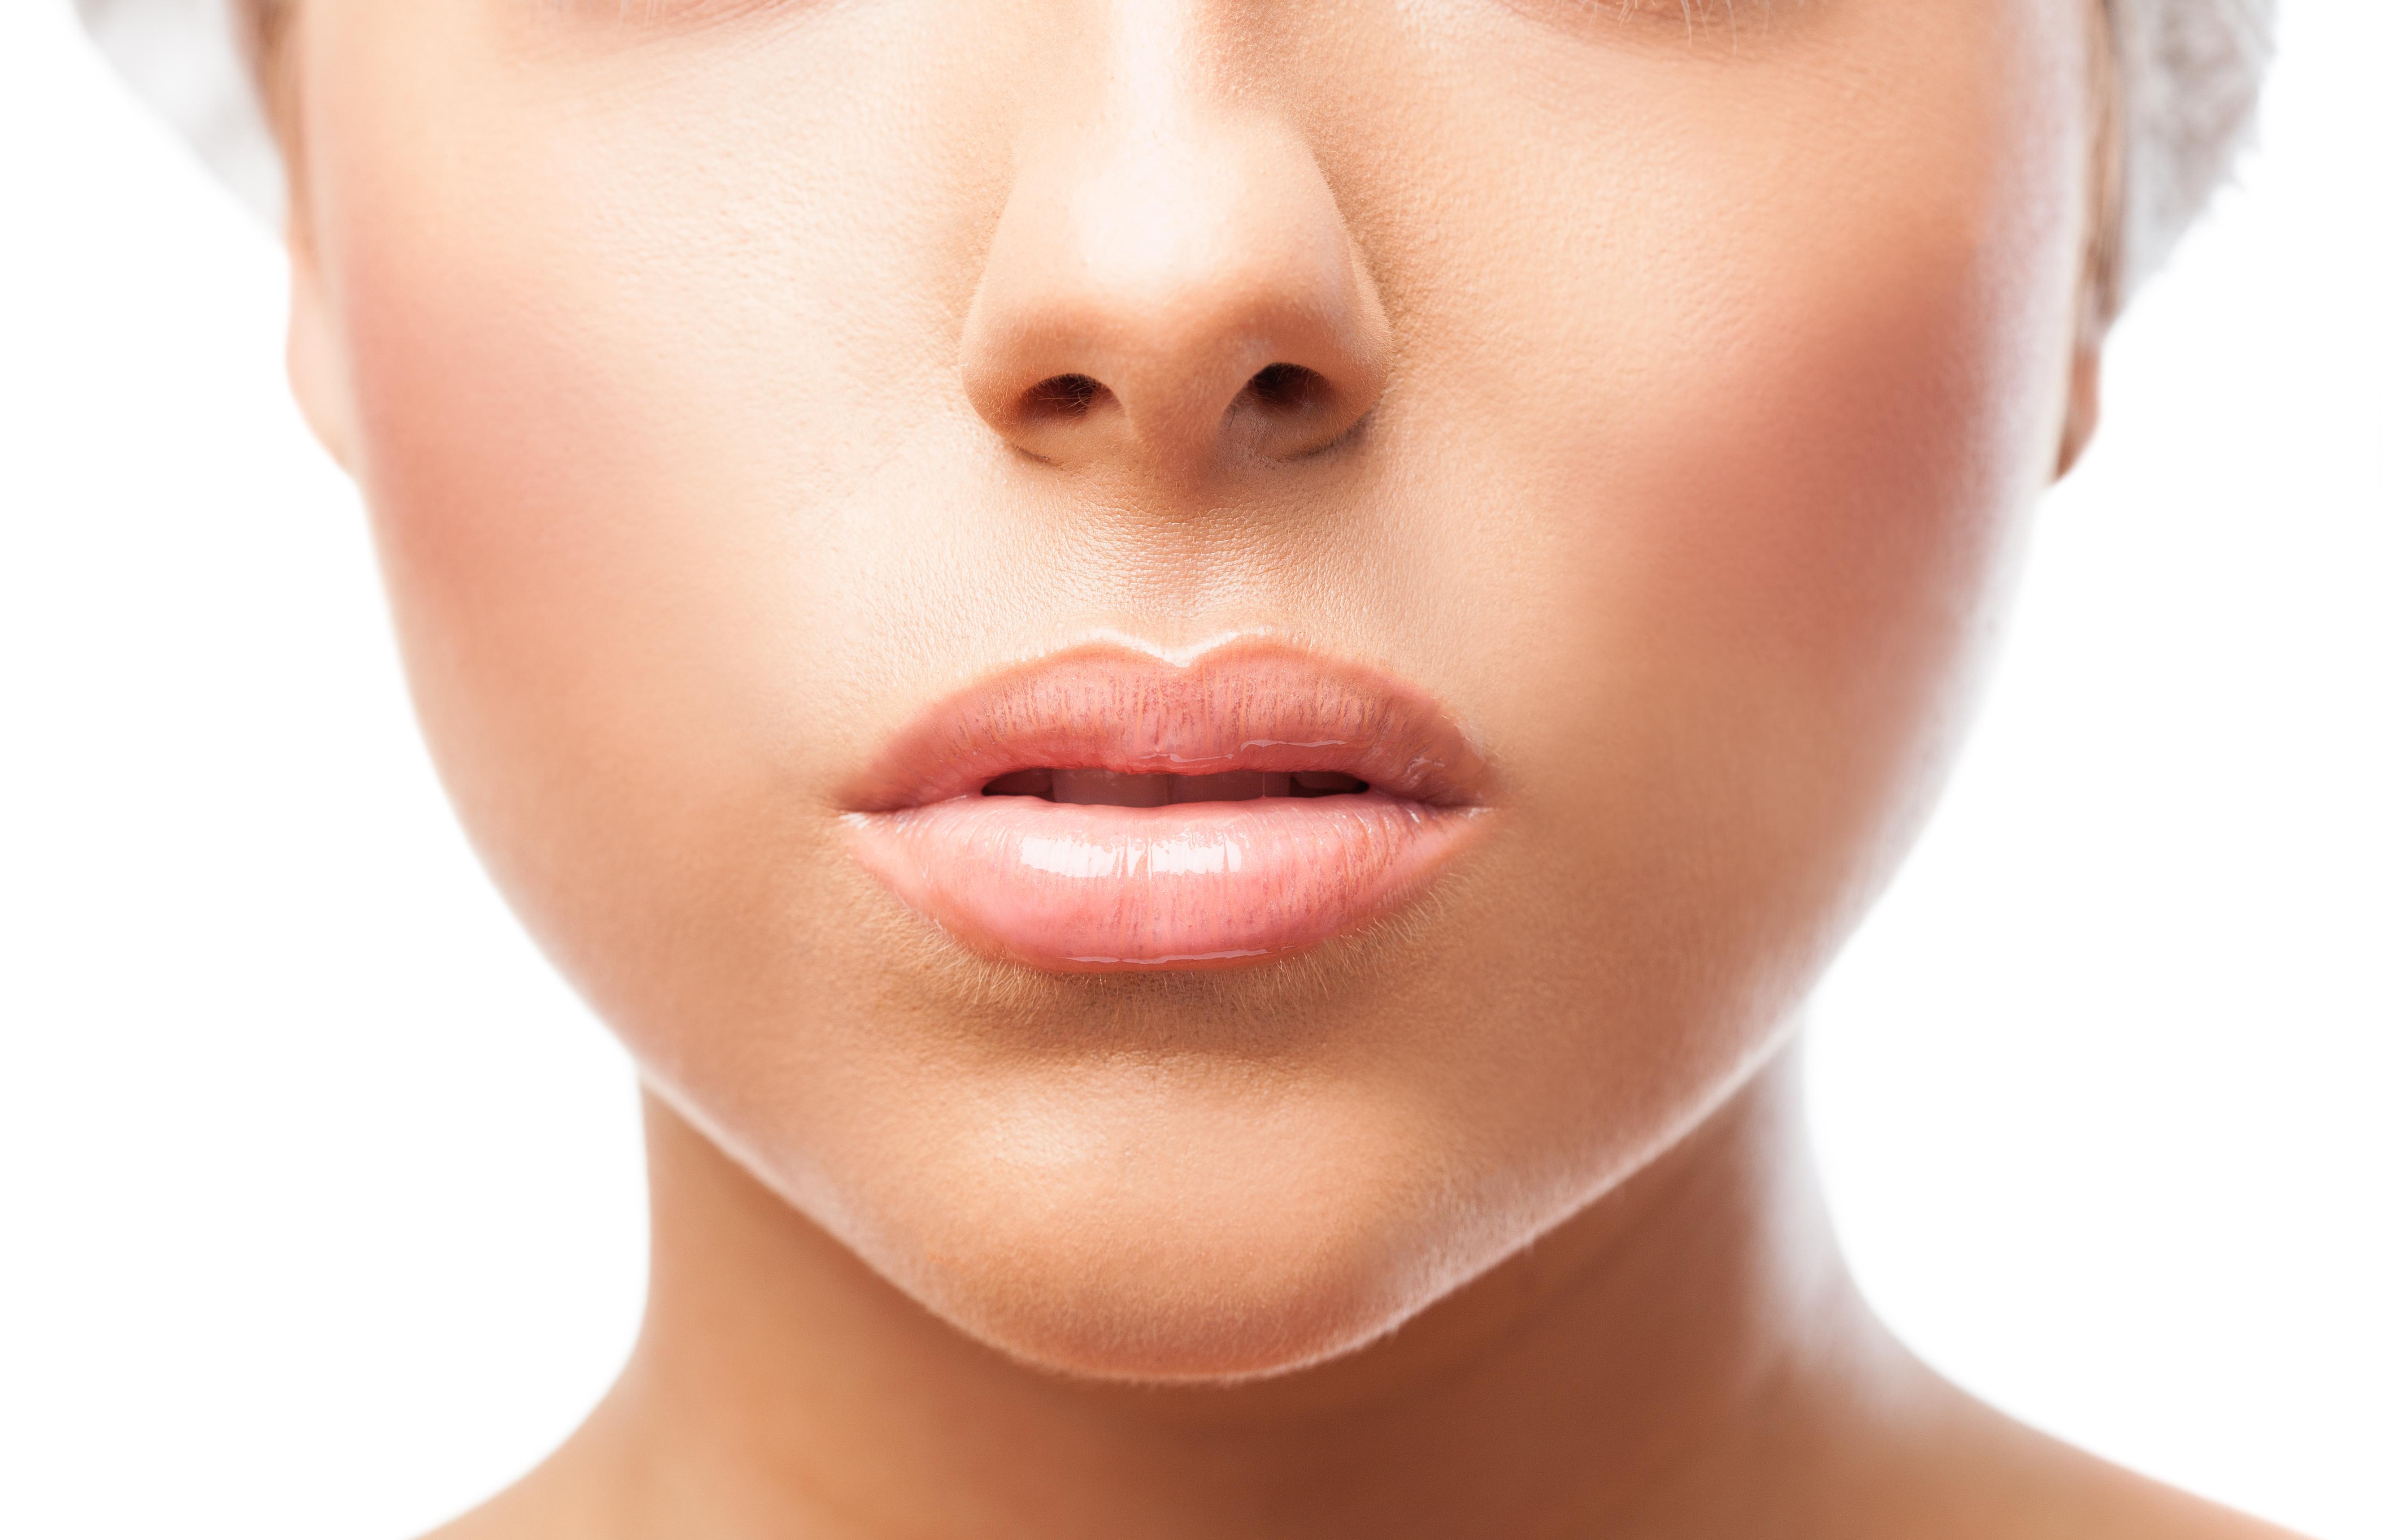 botox-hautarzt-dermatologe-lifting-vampirlifting